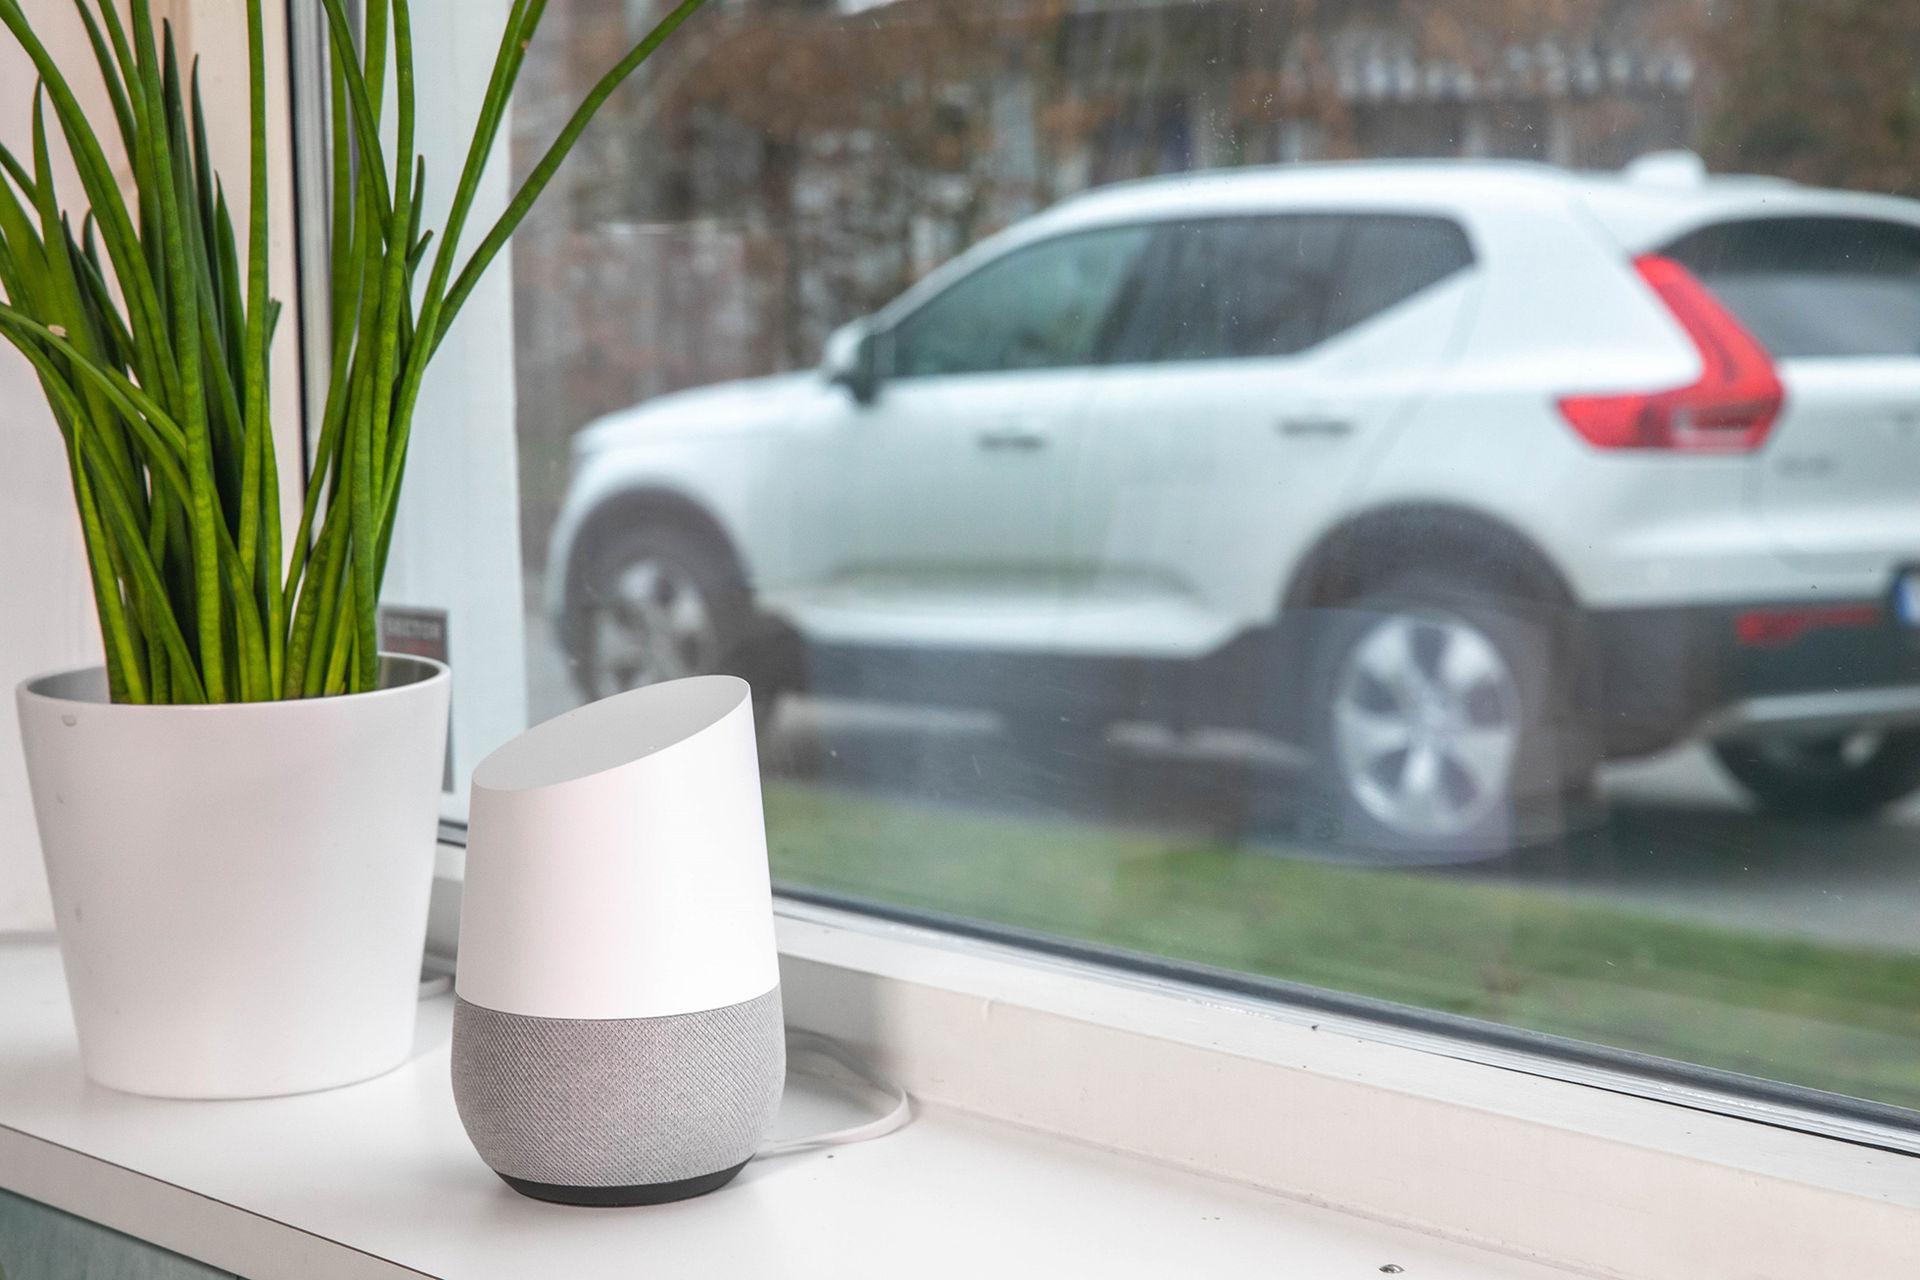 Prata svenska med din Volvo via Google Home